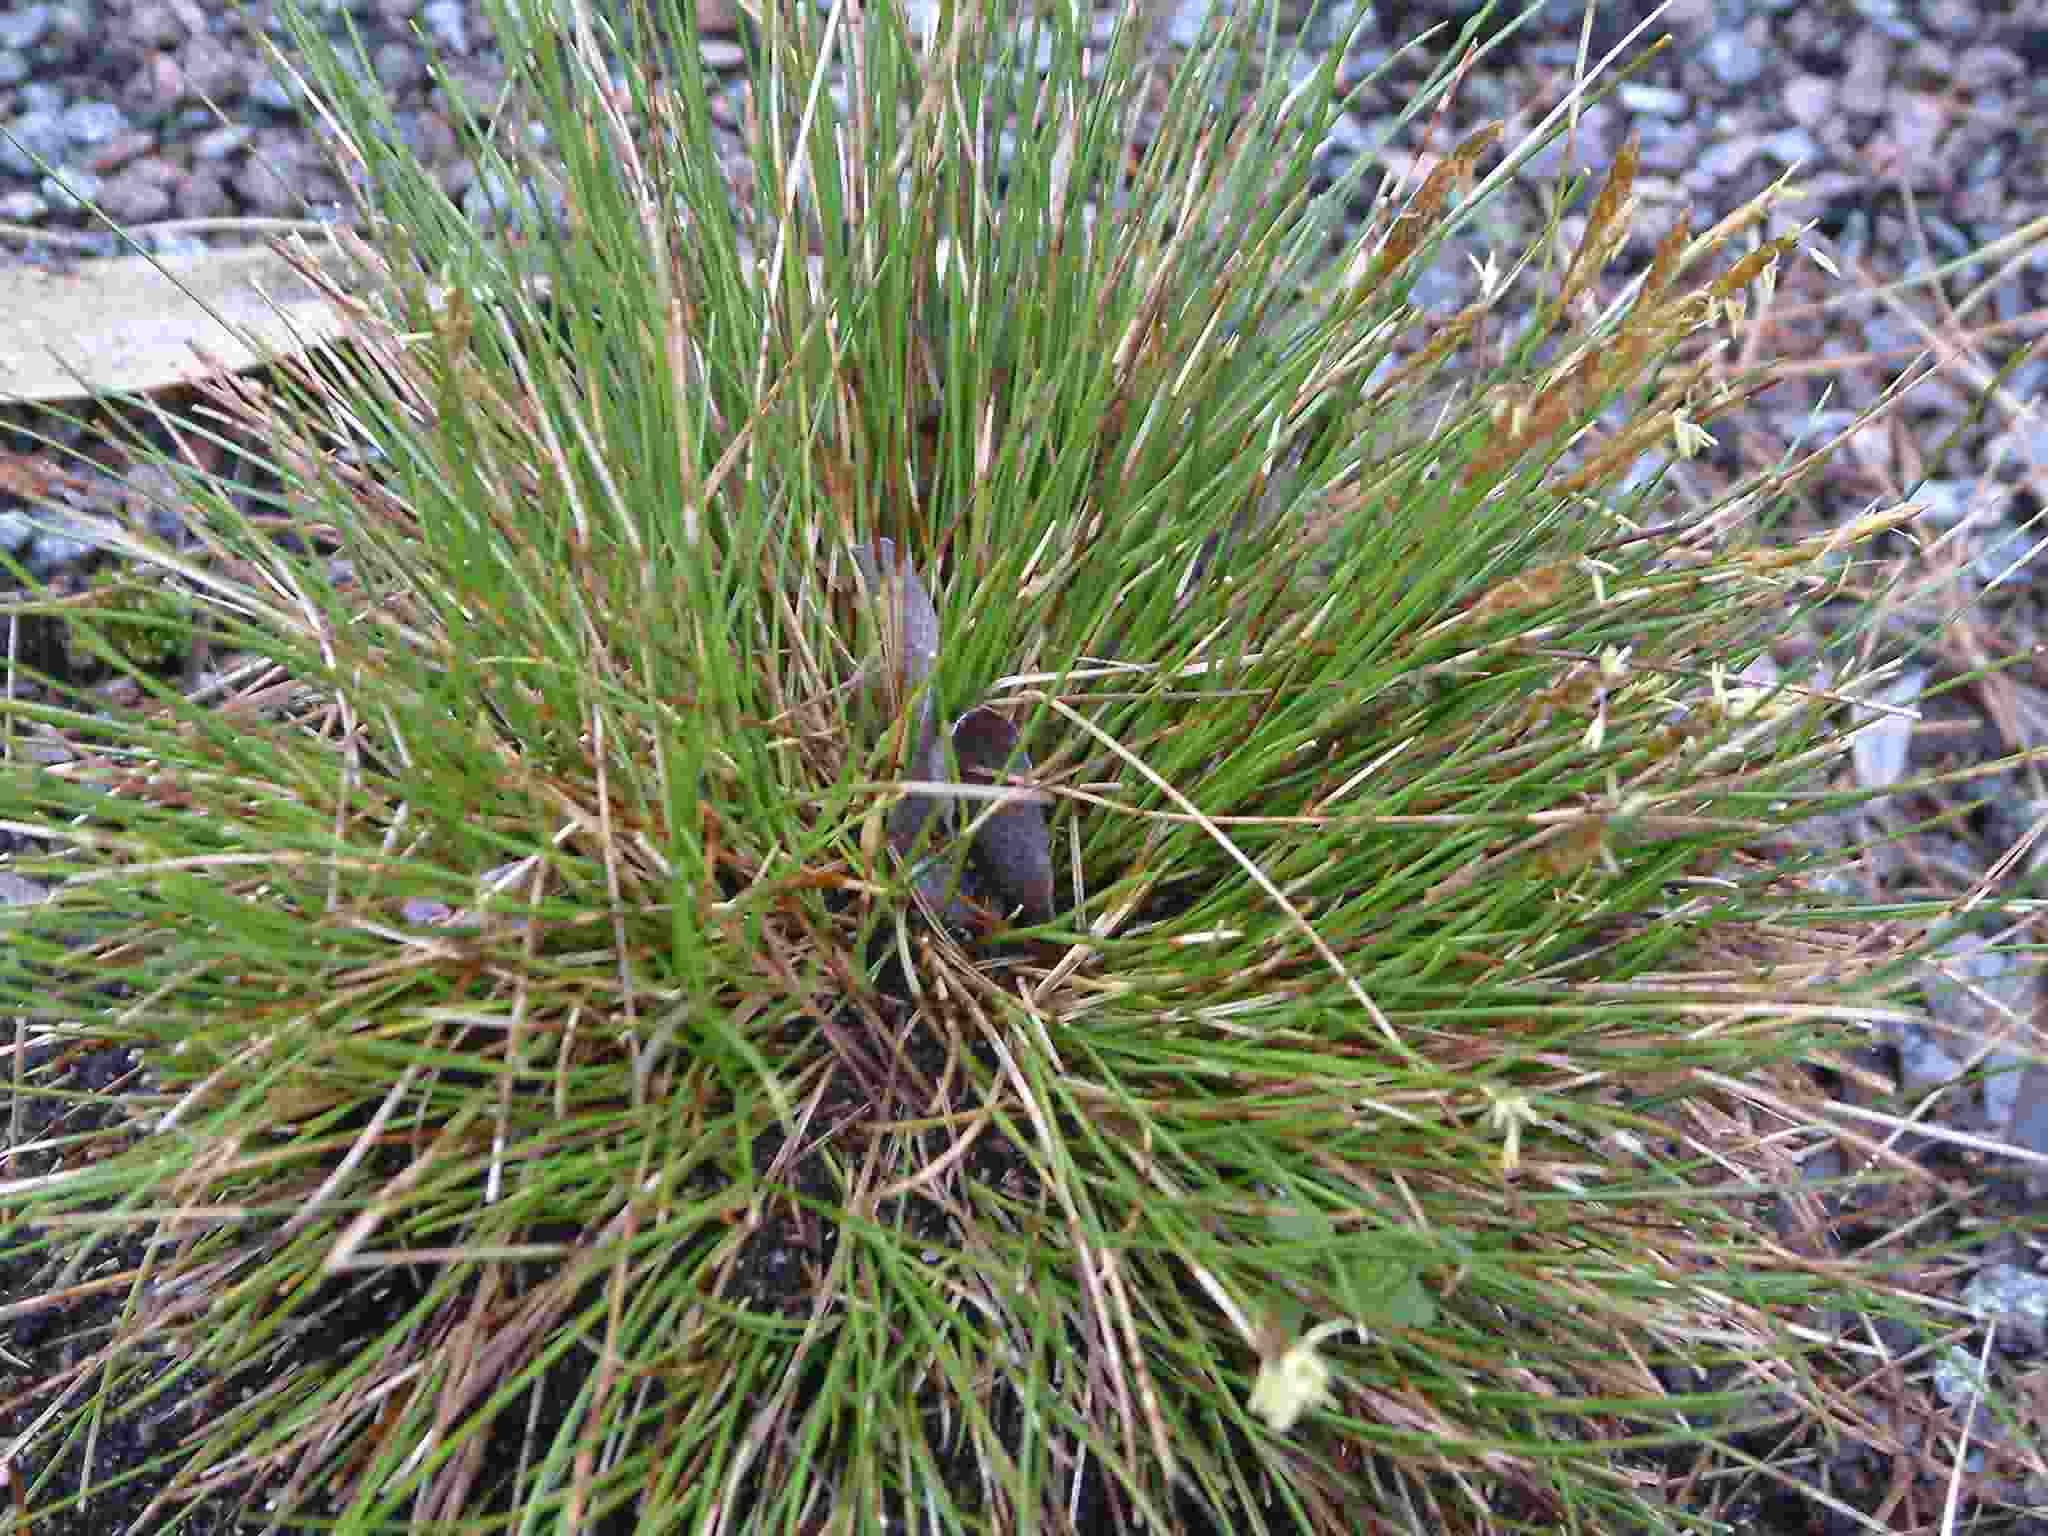 Carex dioica